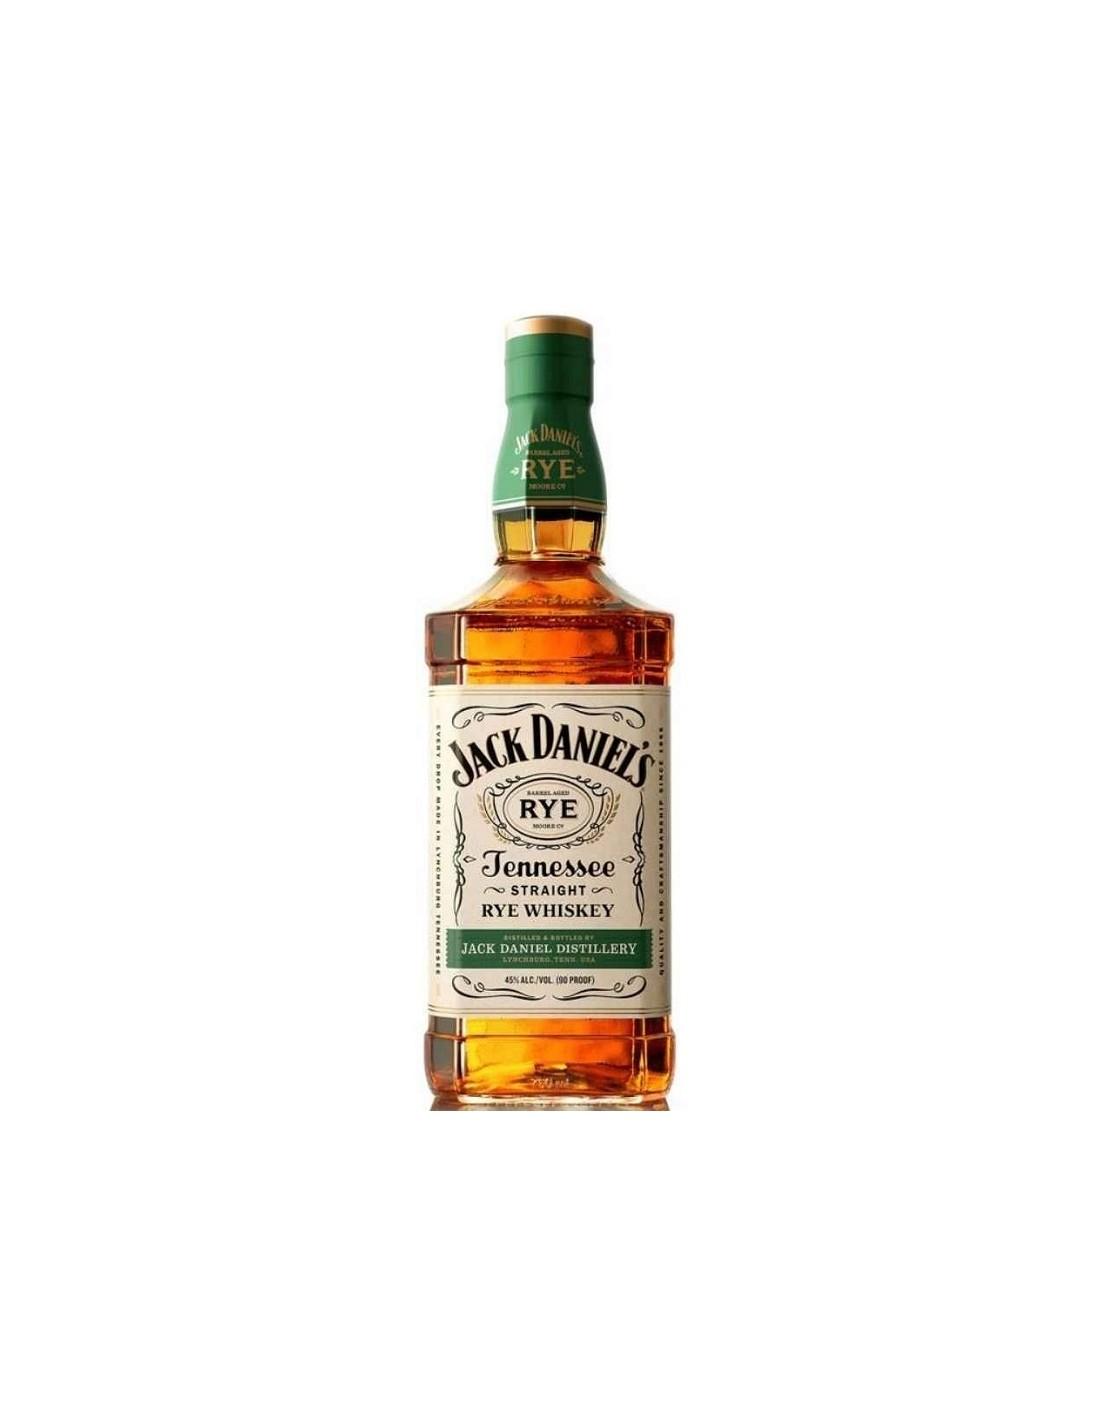 Whisky Bourbon Jack Daniel's Rye, 45% alc., 0.7L, America